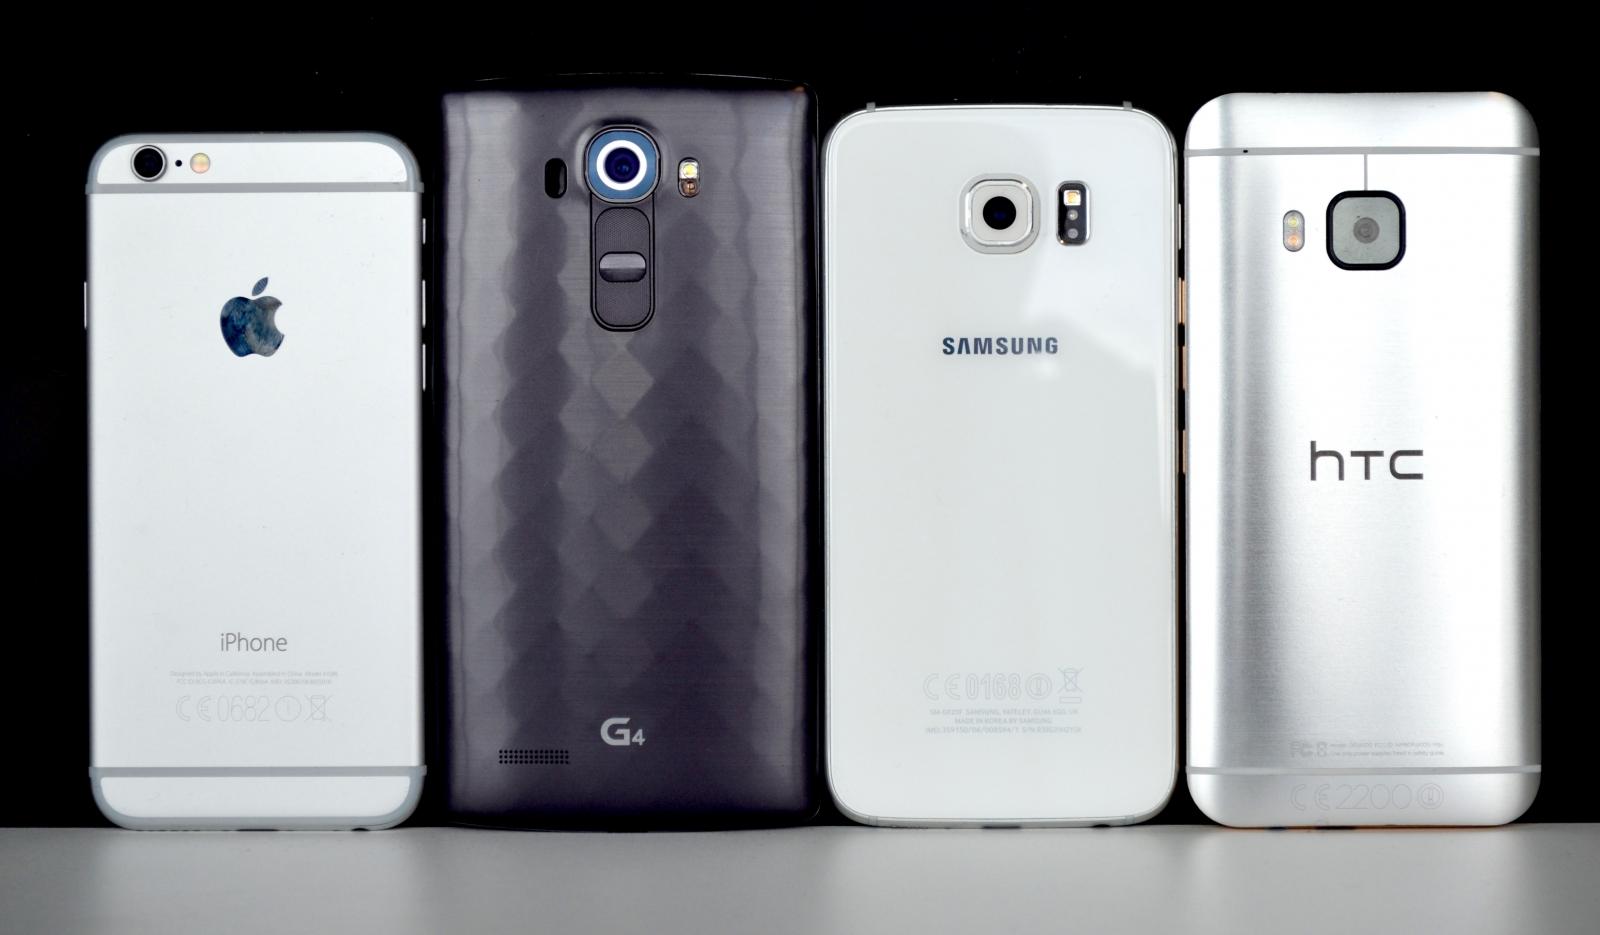 best smartphone of 2015 so far iphone 6 vs samsung galaxy